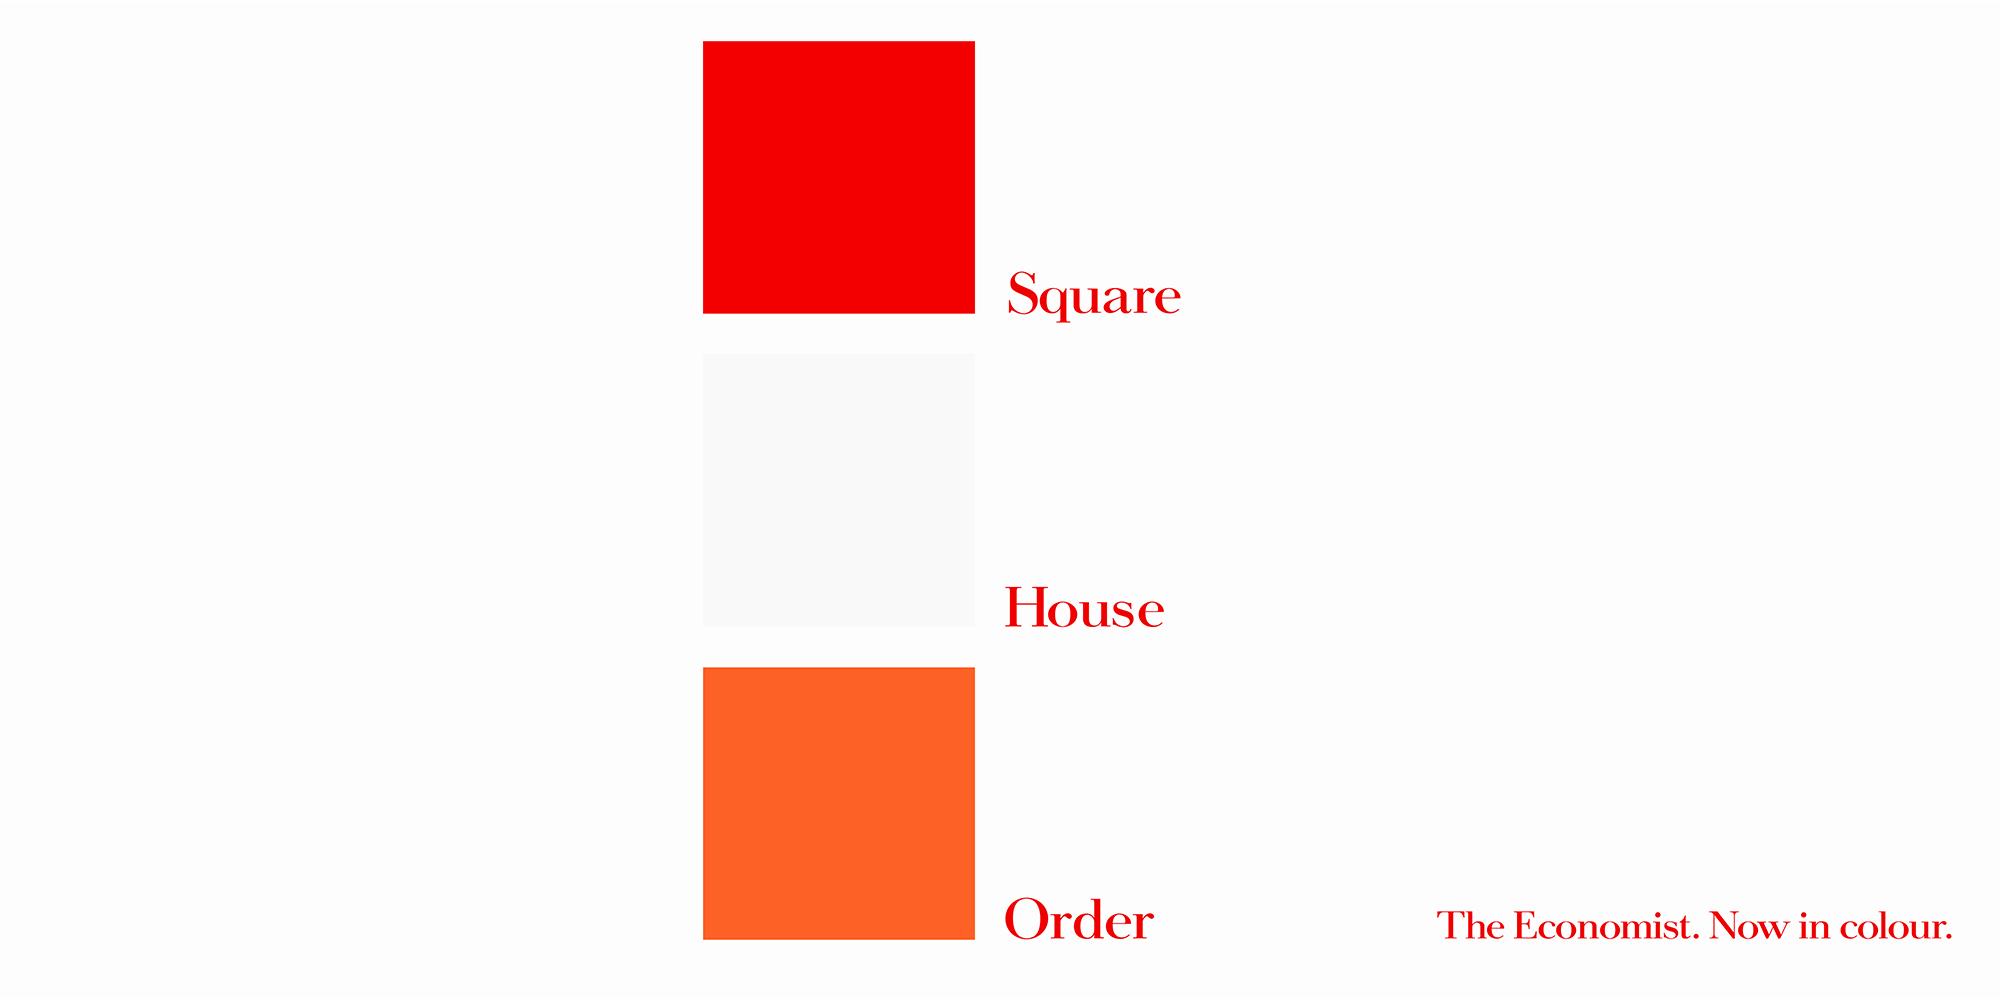 'Red Square' The Economist_Colour, Dave Dye, AMV_BBDO.